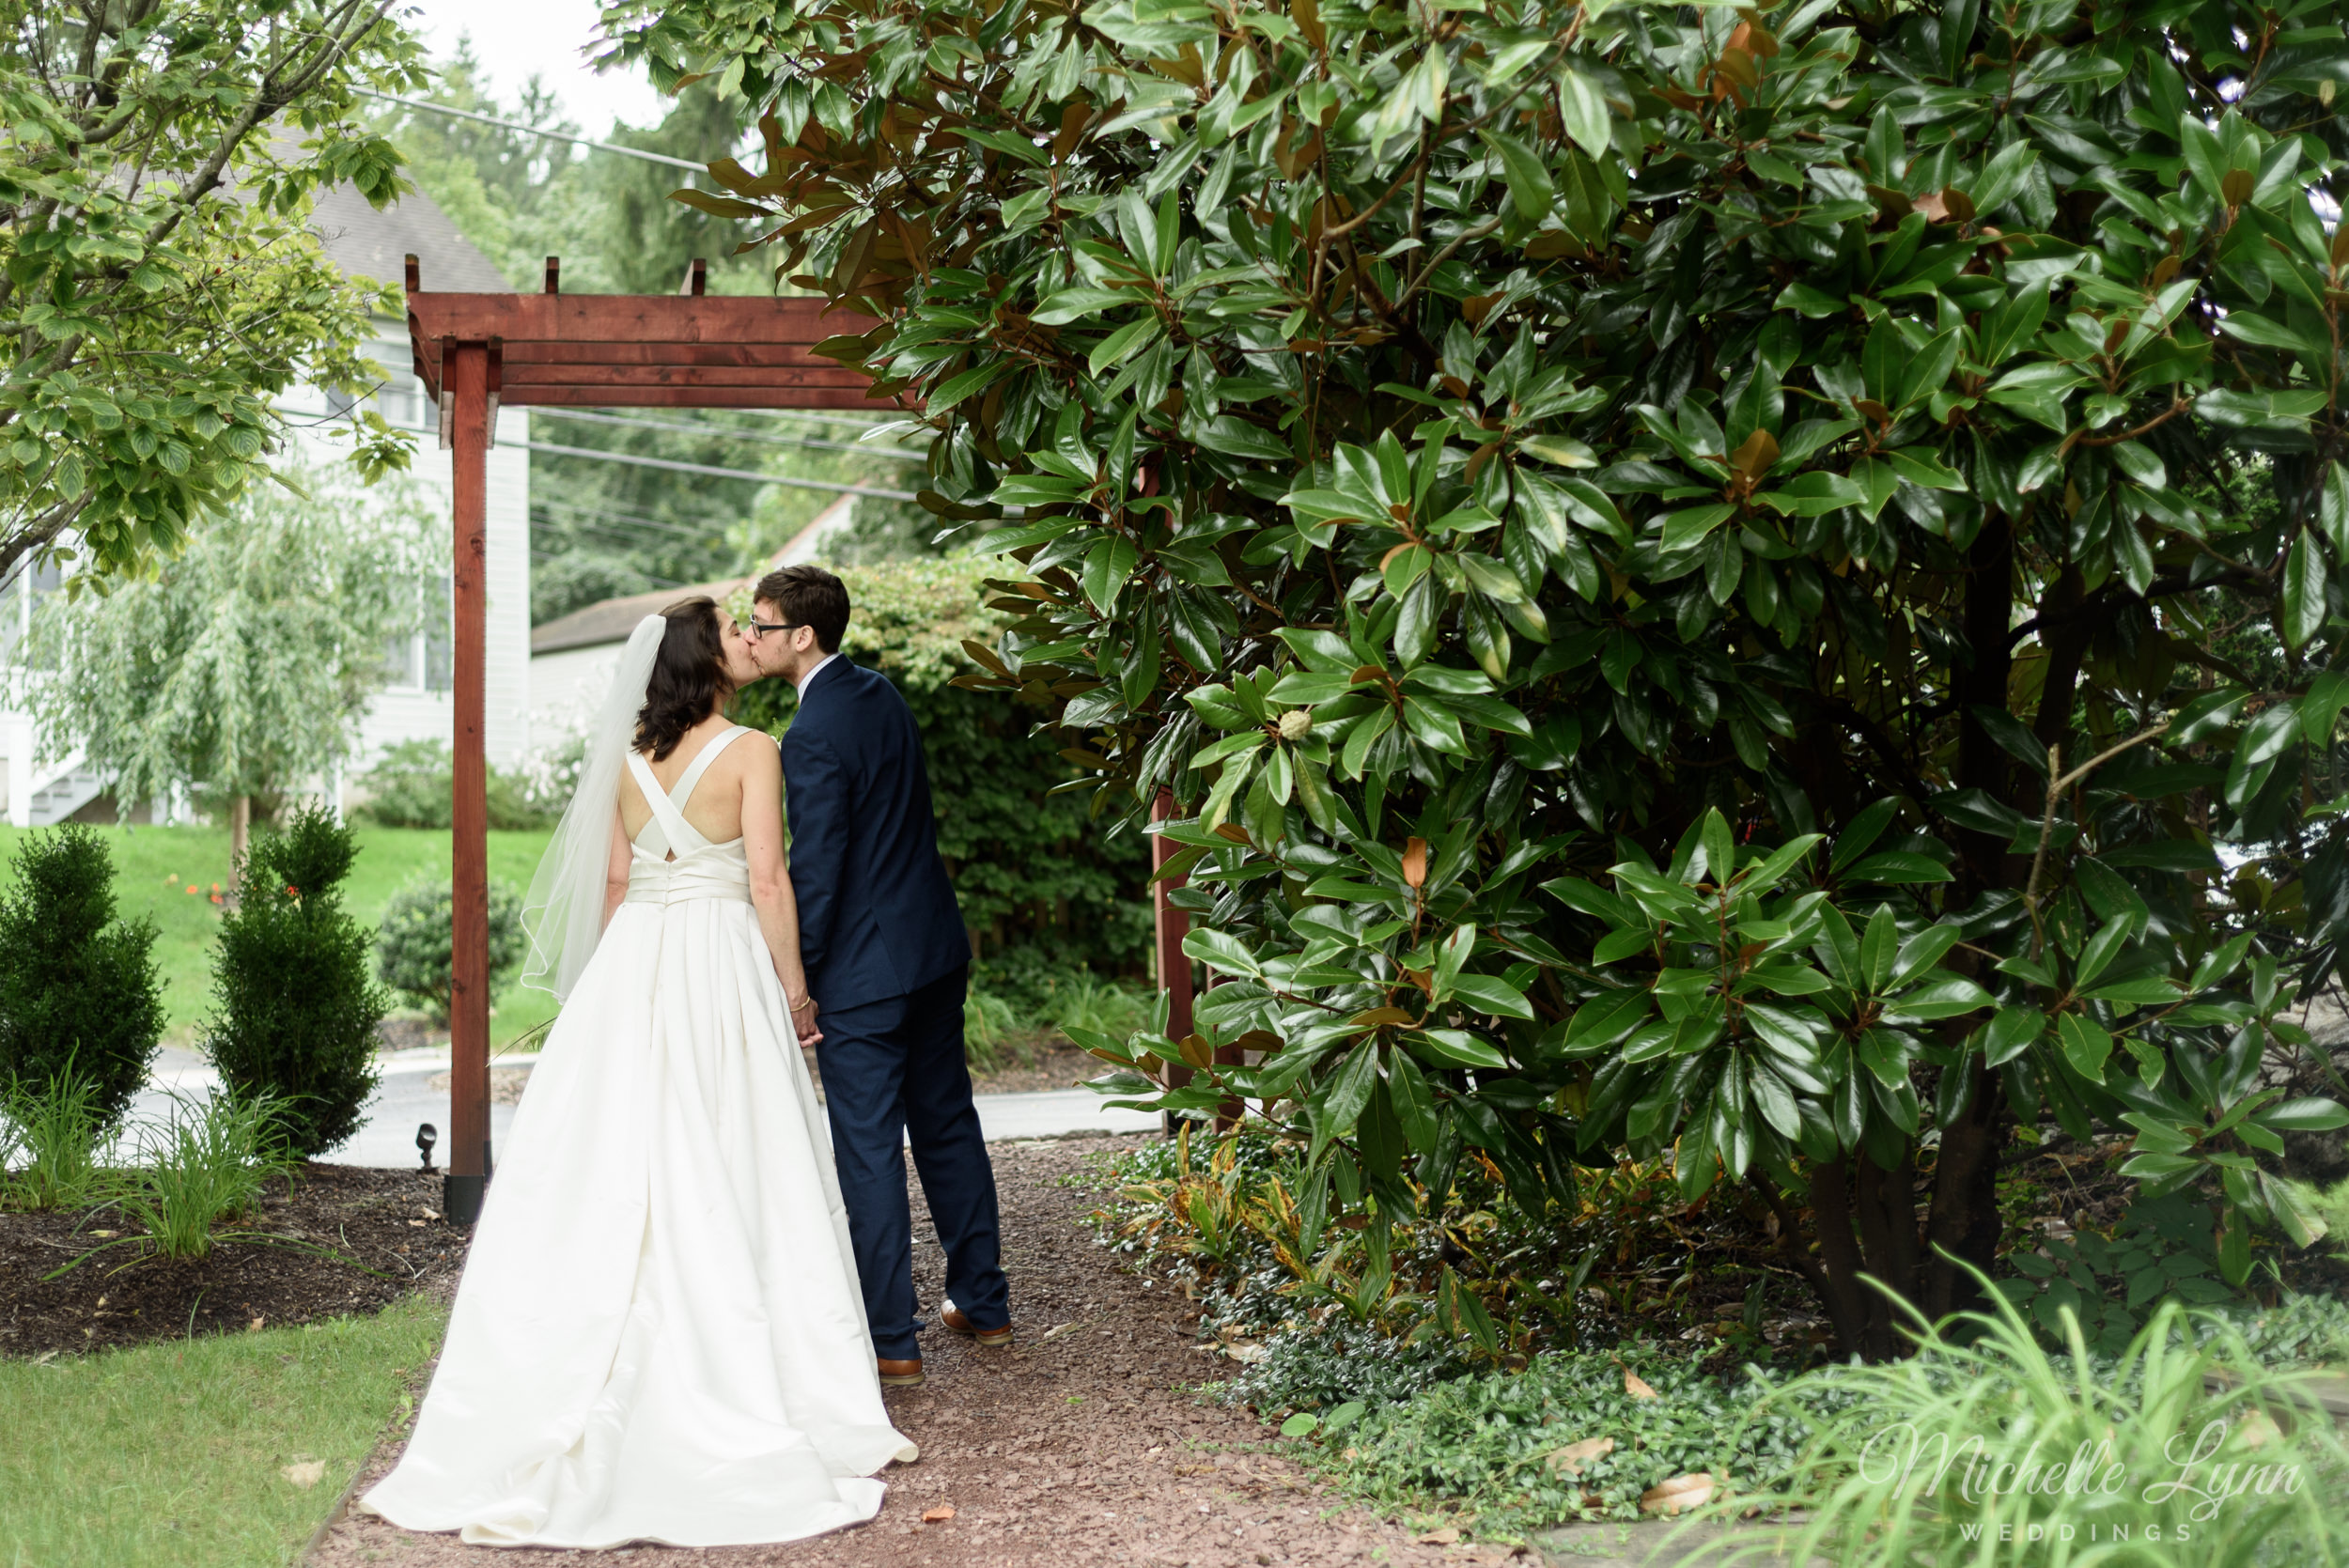 mlw-general-warren-malvern-wedding-photographer-37.jpg